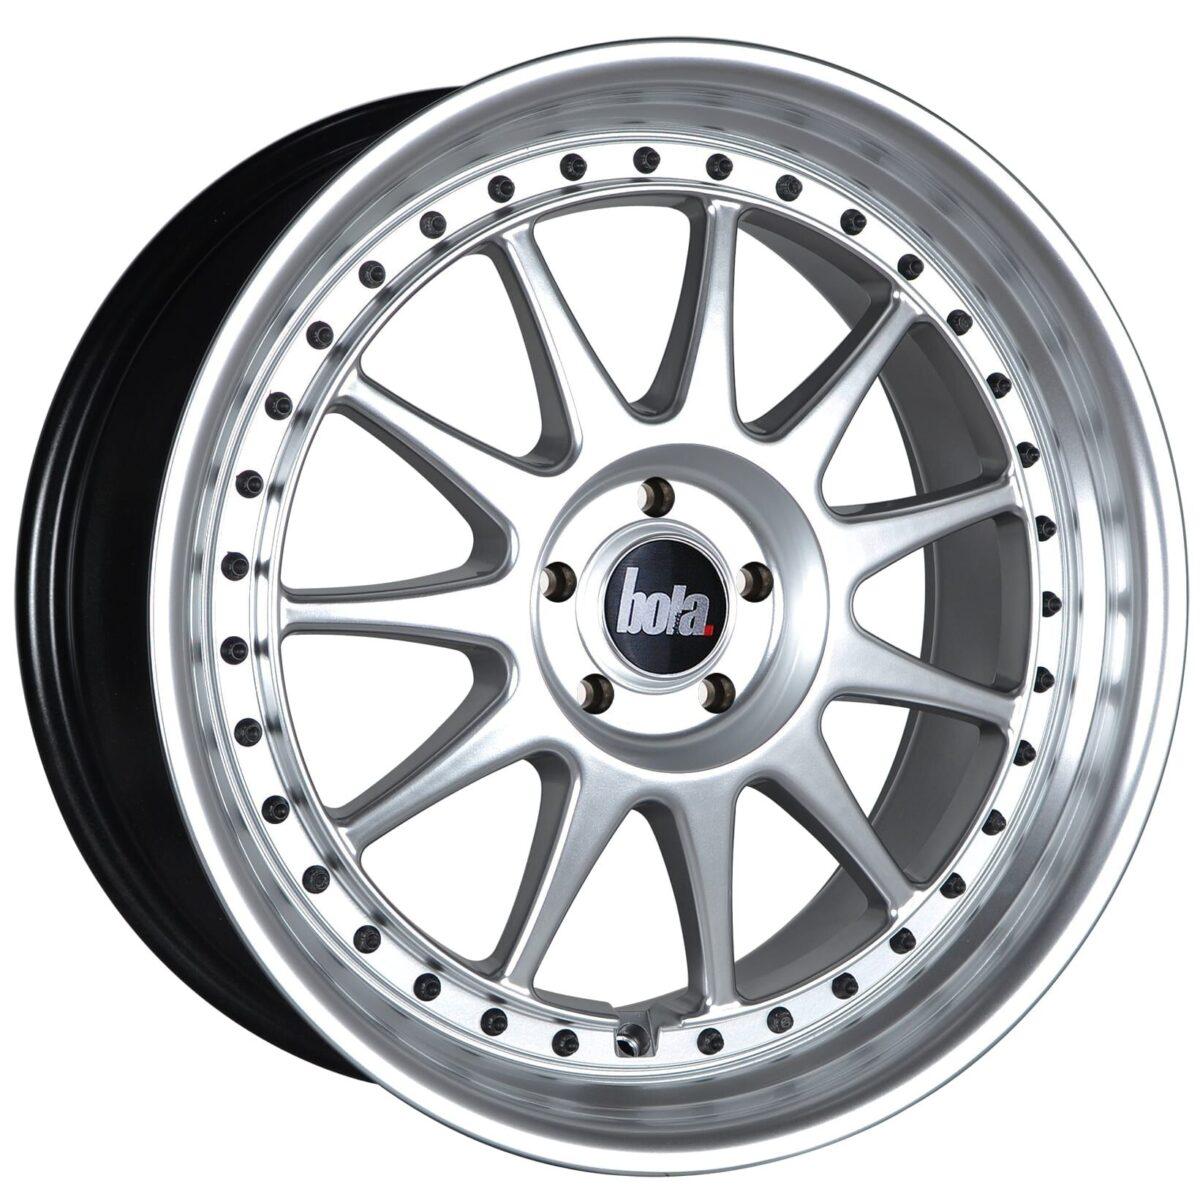 "18"" BOLA B4 Wheels - Hyper Silver with Black Rivets - All BMW Models"